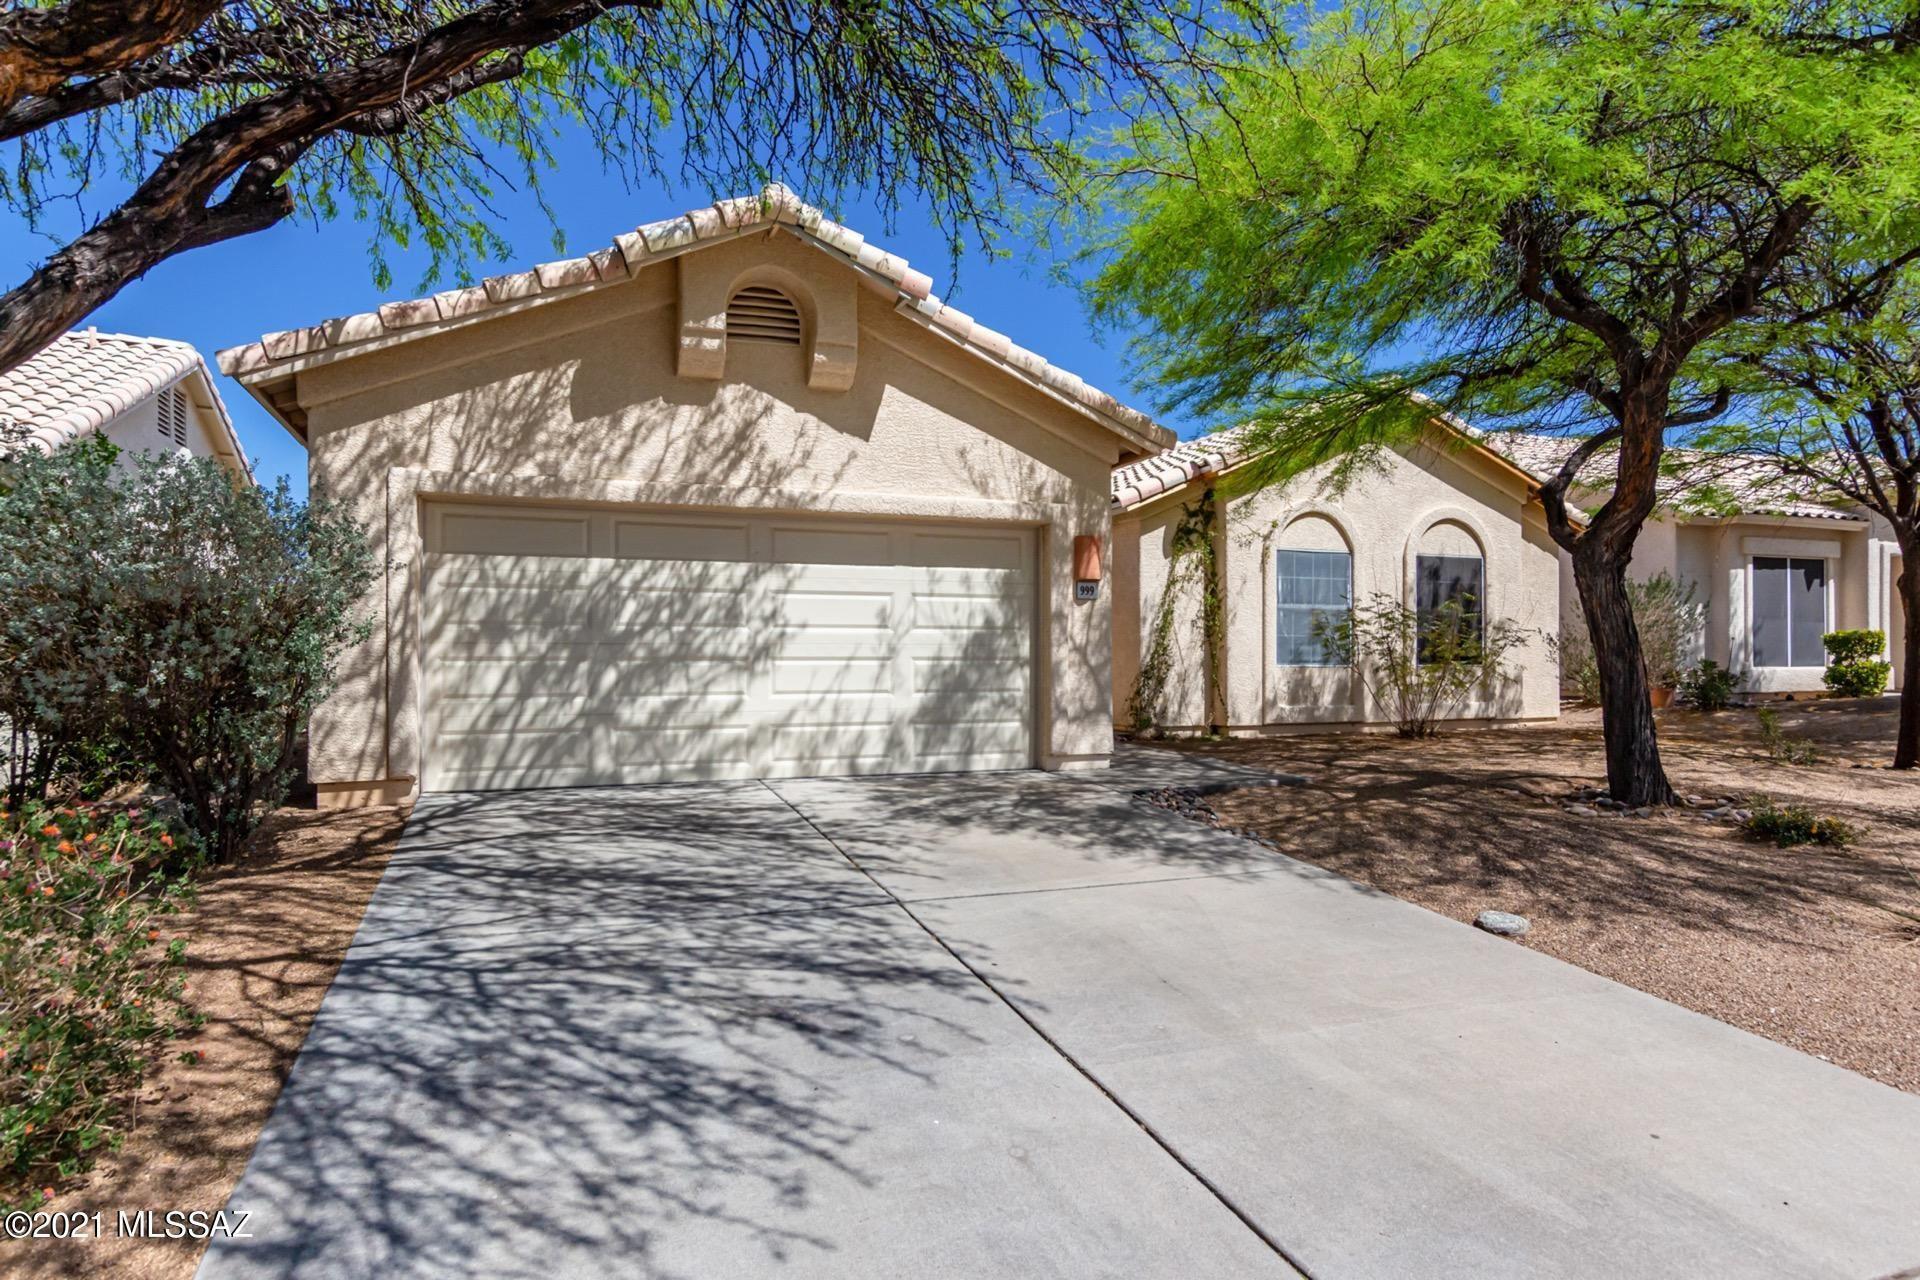 999 S Suncove Drive, Tucson, AZ 85748 - MLS#: 22109712